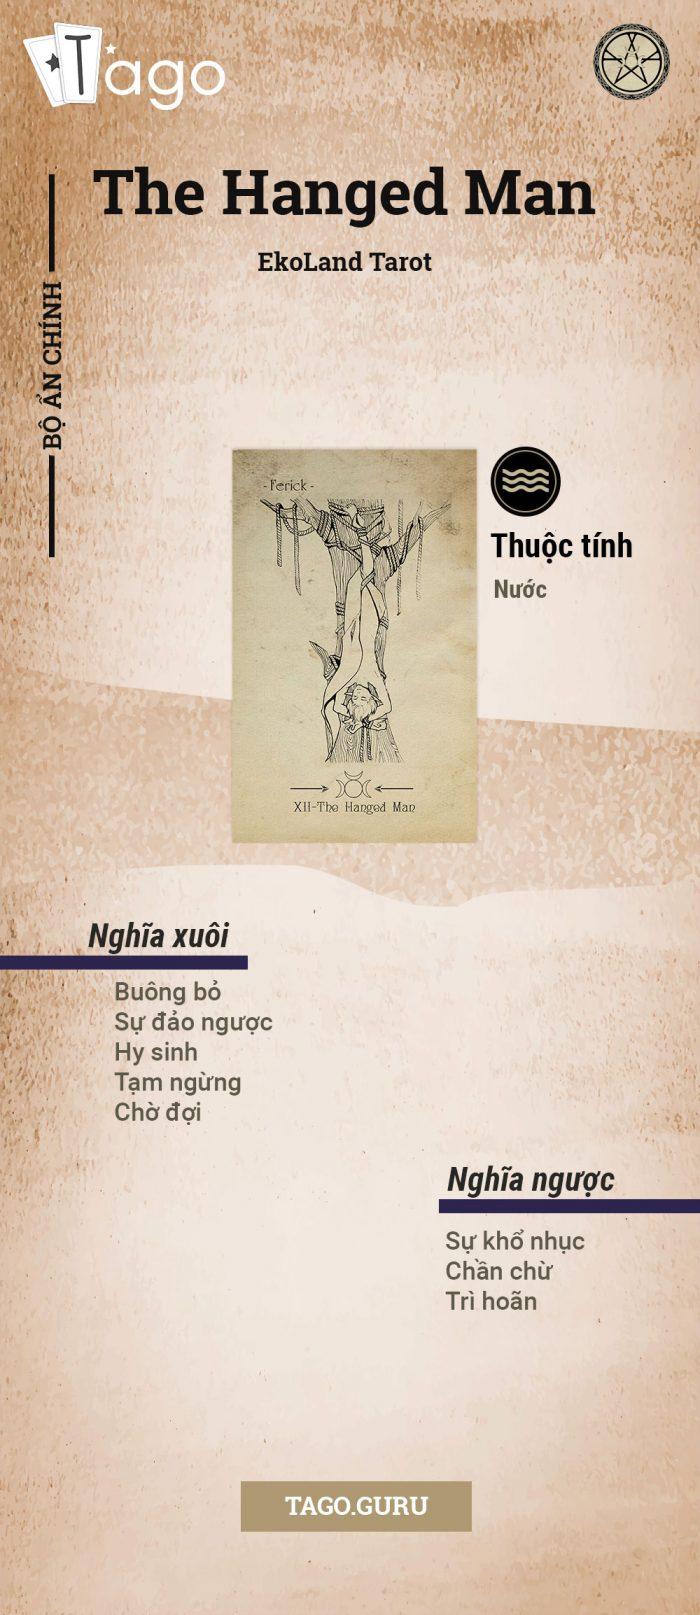 TAGO-Cheat-Sheet-The-Hanged-Man